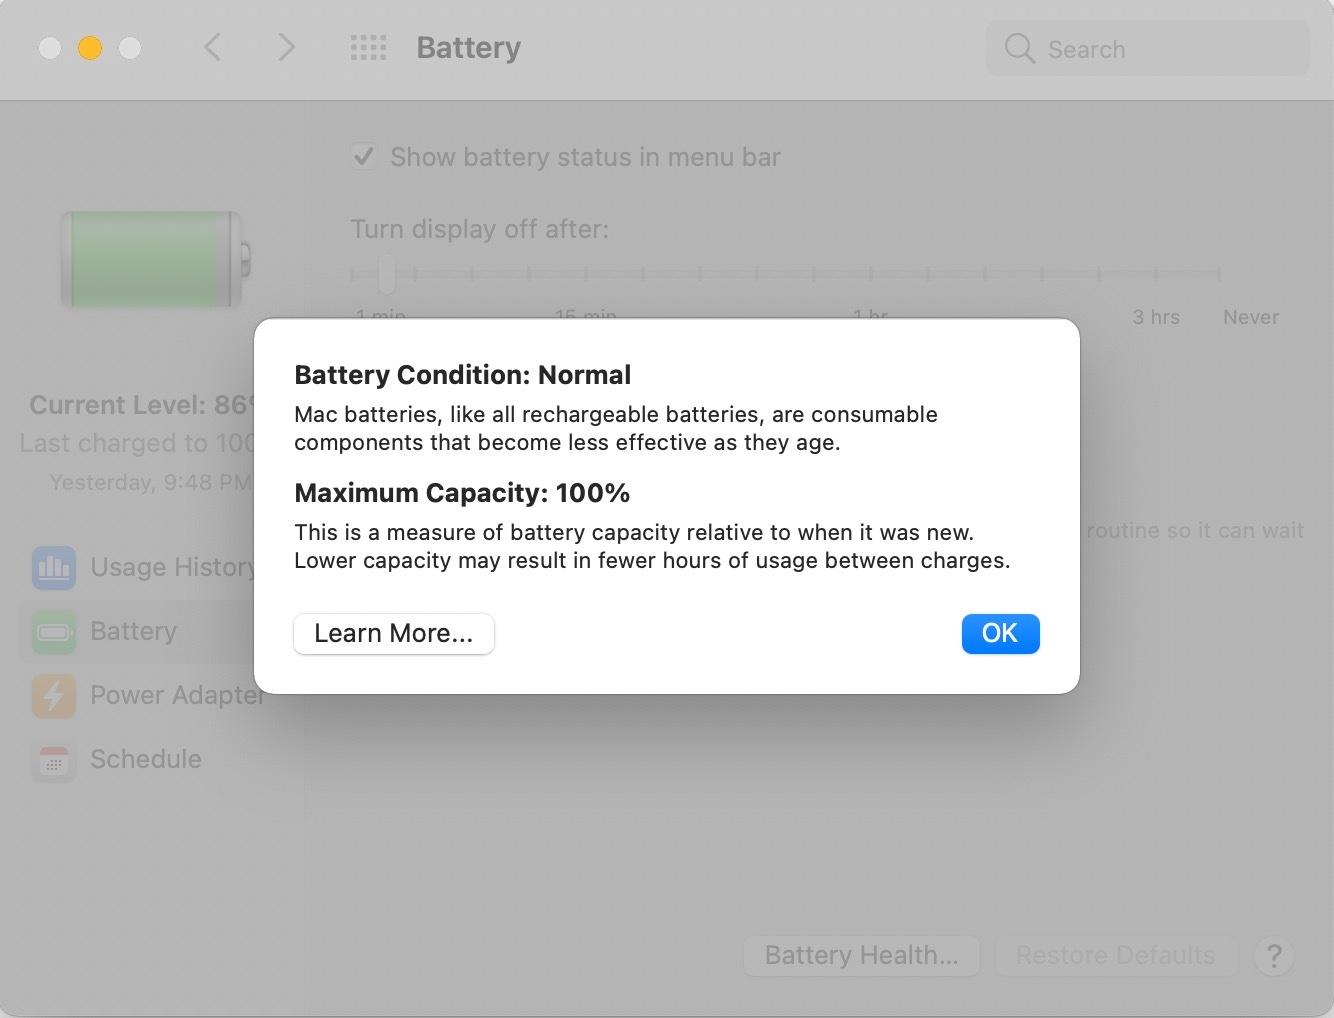 Apple's Battery Health